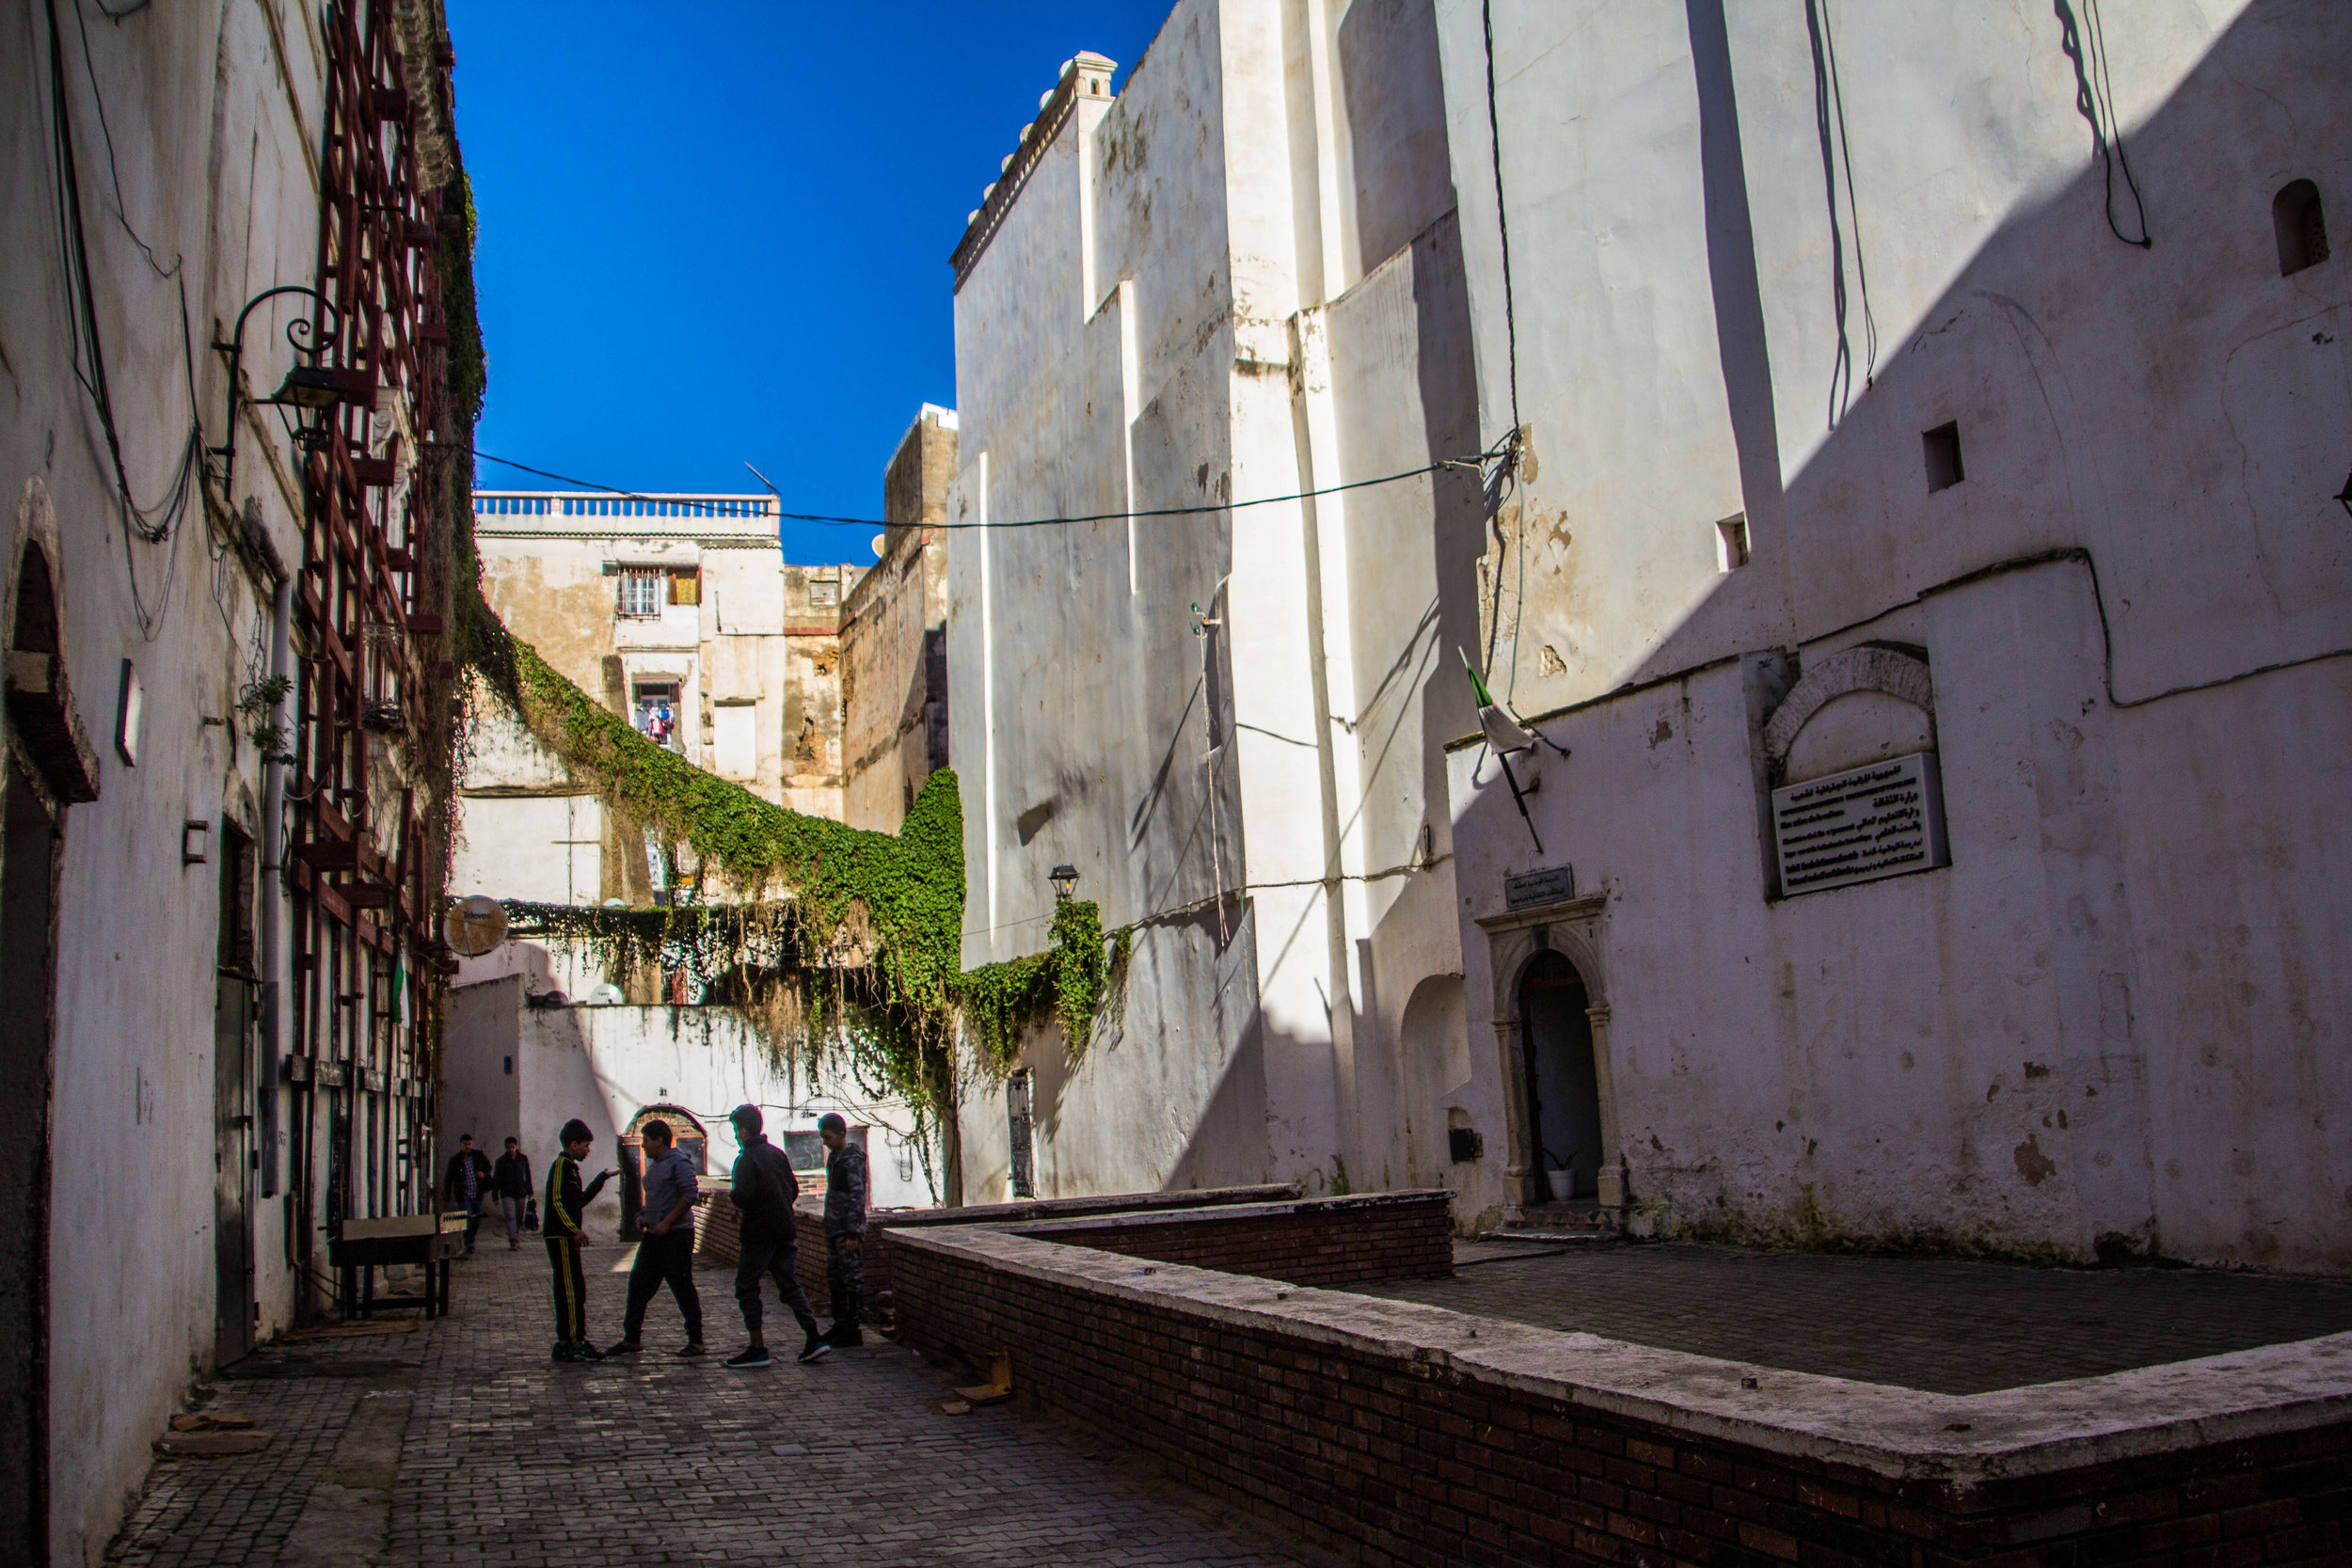 casbah-photography-algiers-algeria-alger-74.jpg